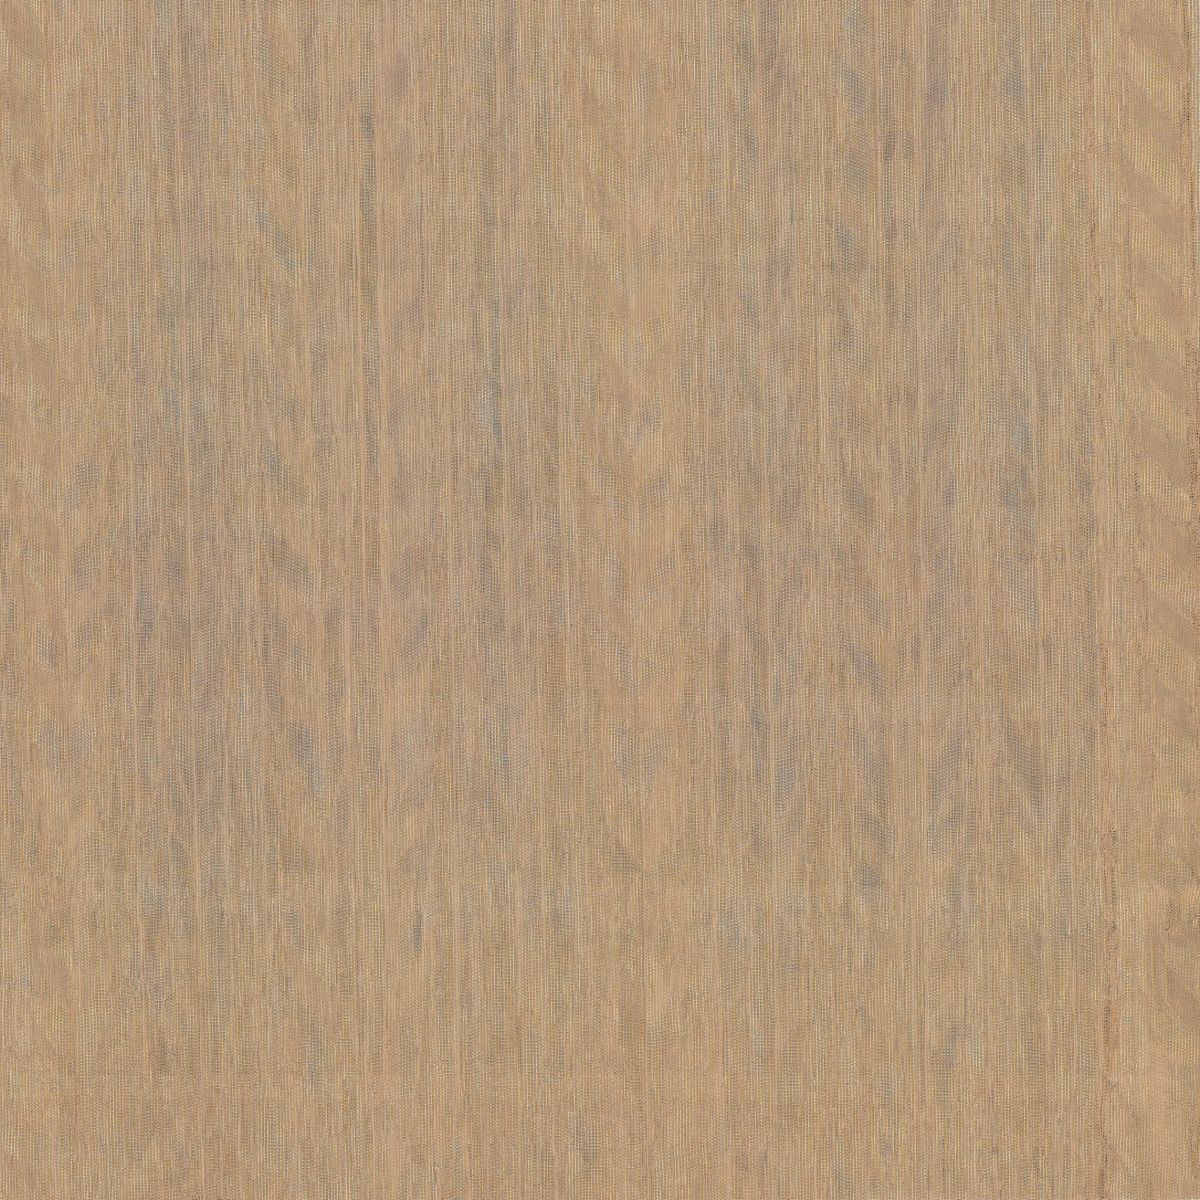 tapete mit plisseestoff amazone 2 23503 amazone 2 decowunder. Black Bedroom Furniture Sets. Home Design Ideas